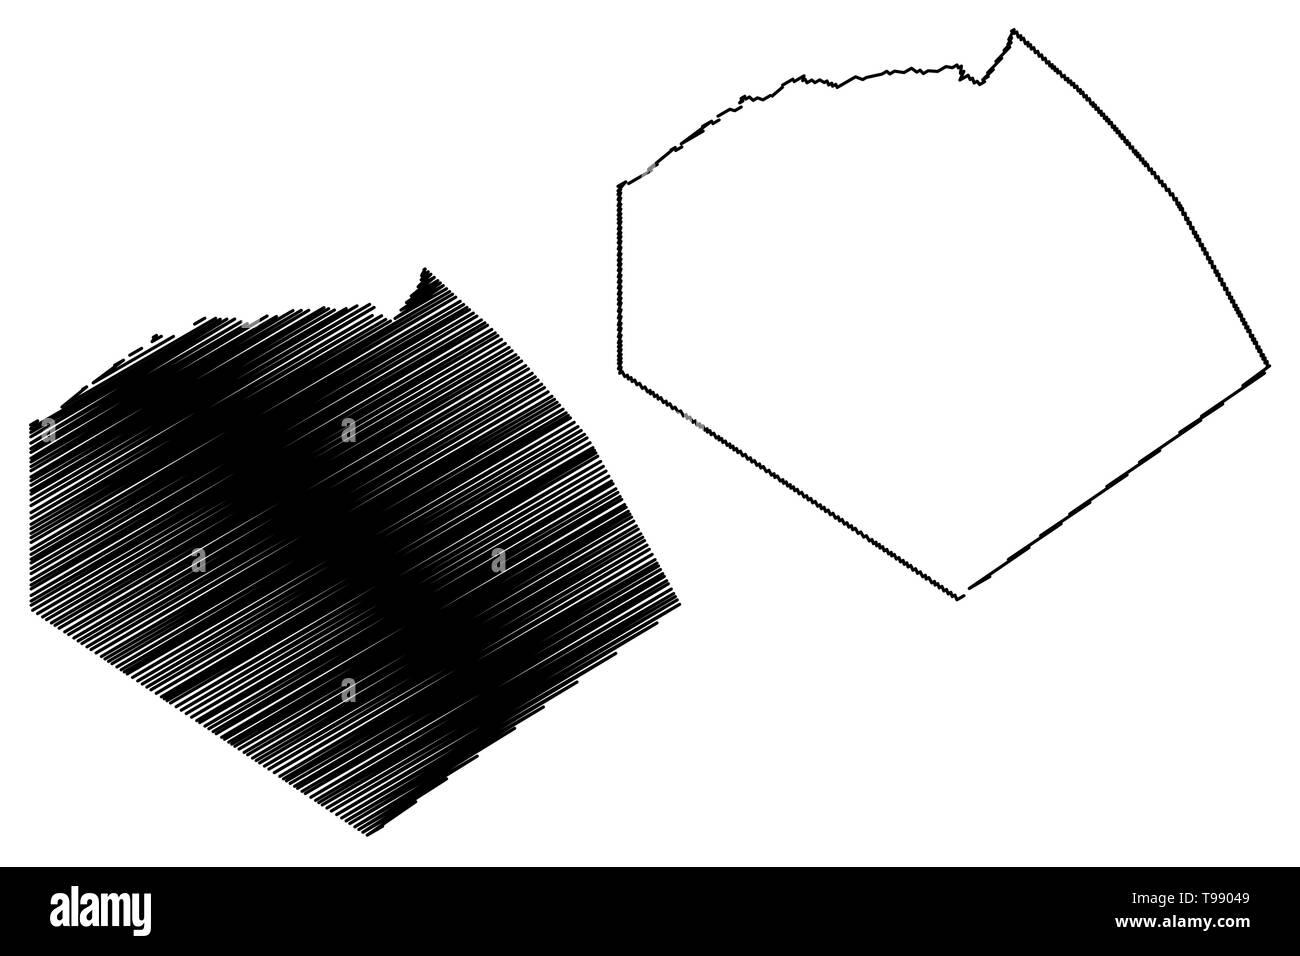 Tindouf Province (Provinces of Algeria, Peoples Democratic Republic of Algeria) map vector illustration, scribble sketch Tinduf map - Stock Image